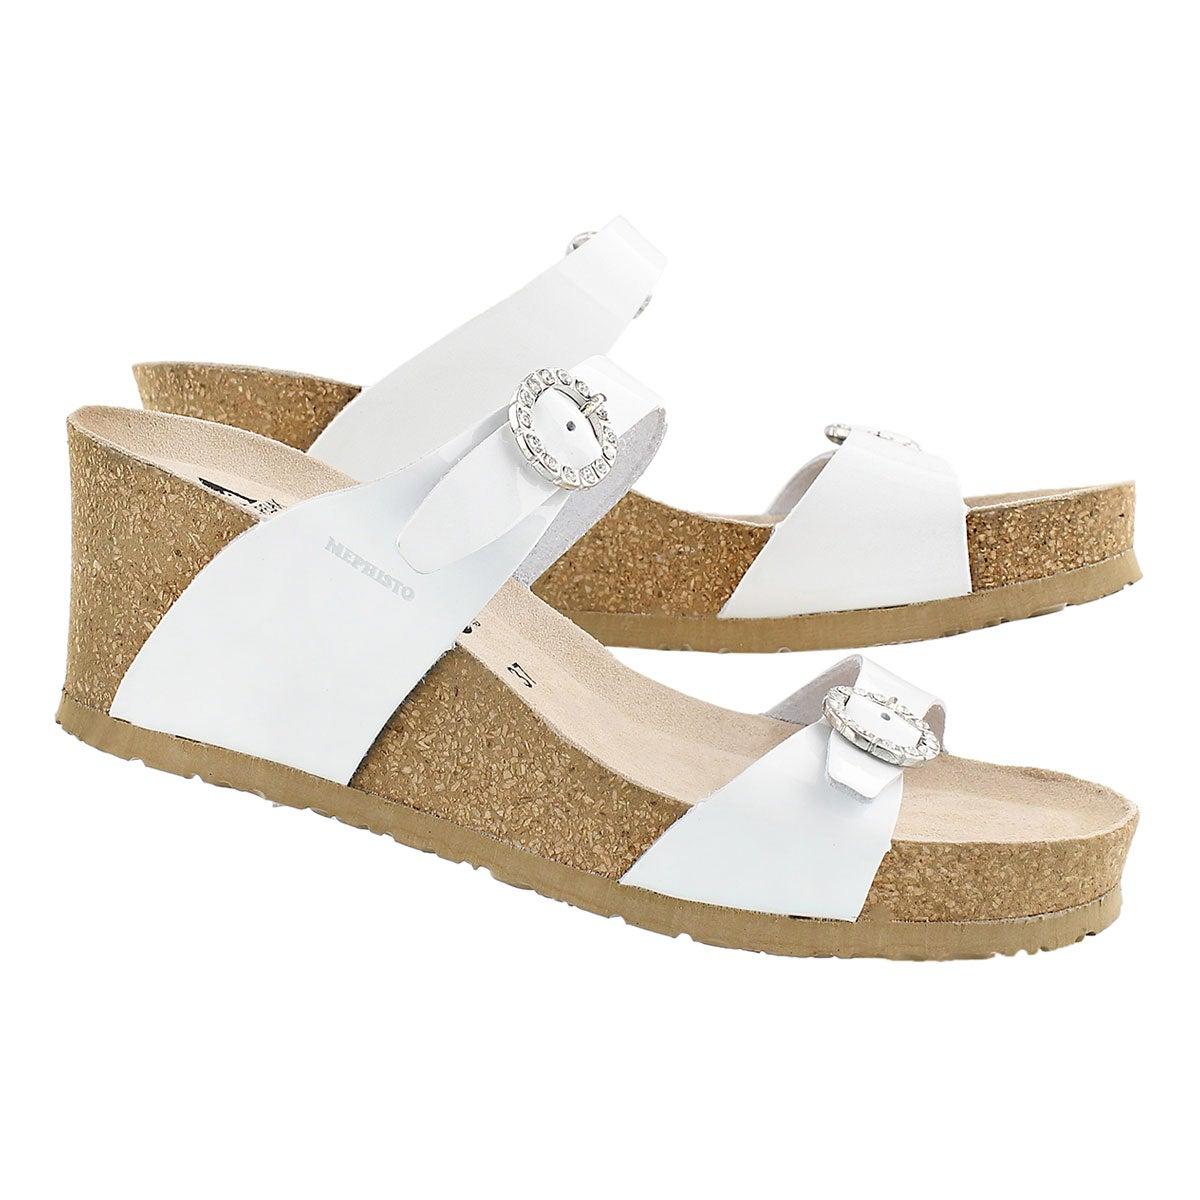 Lds Lidia wht pat crk footbed wdg sandal